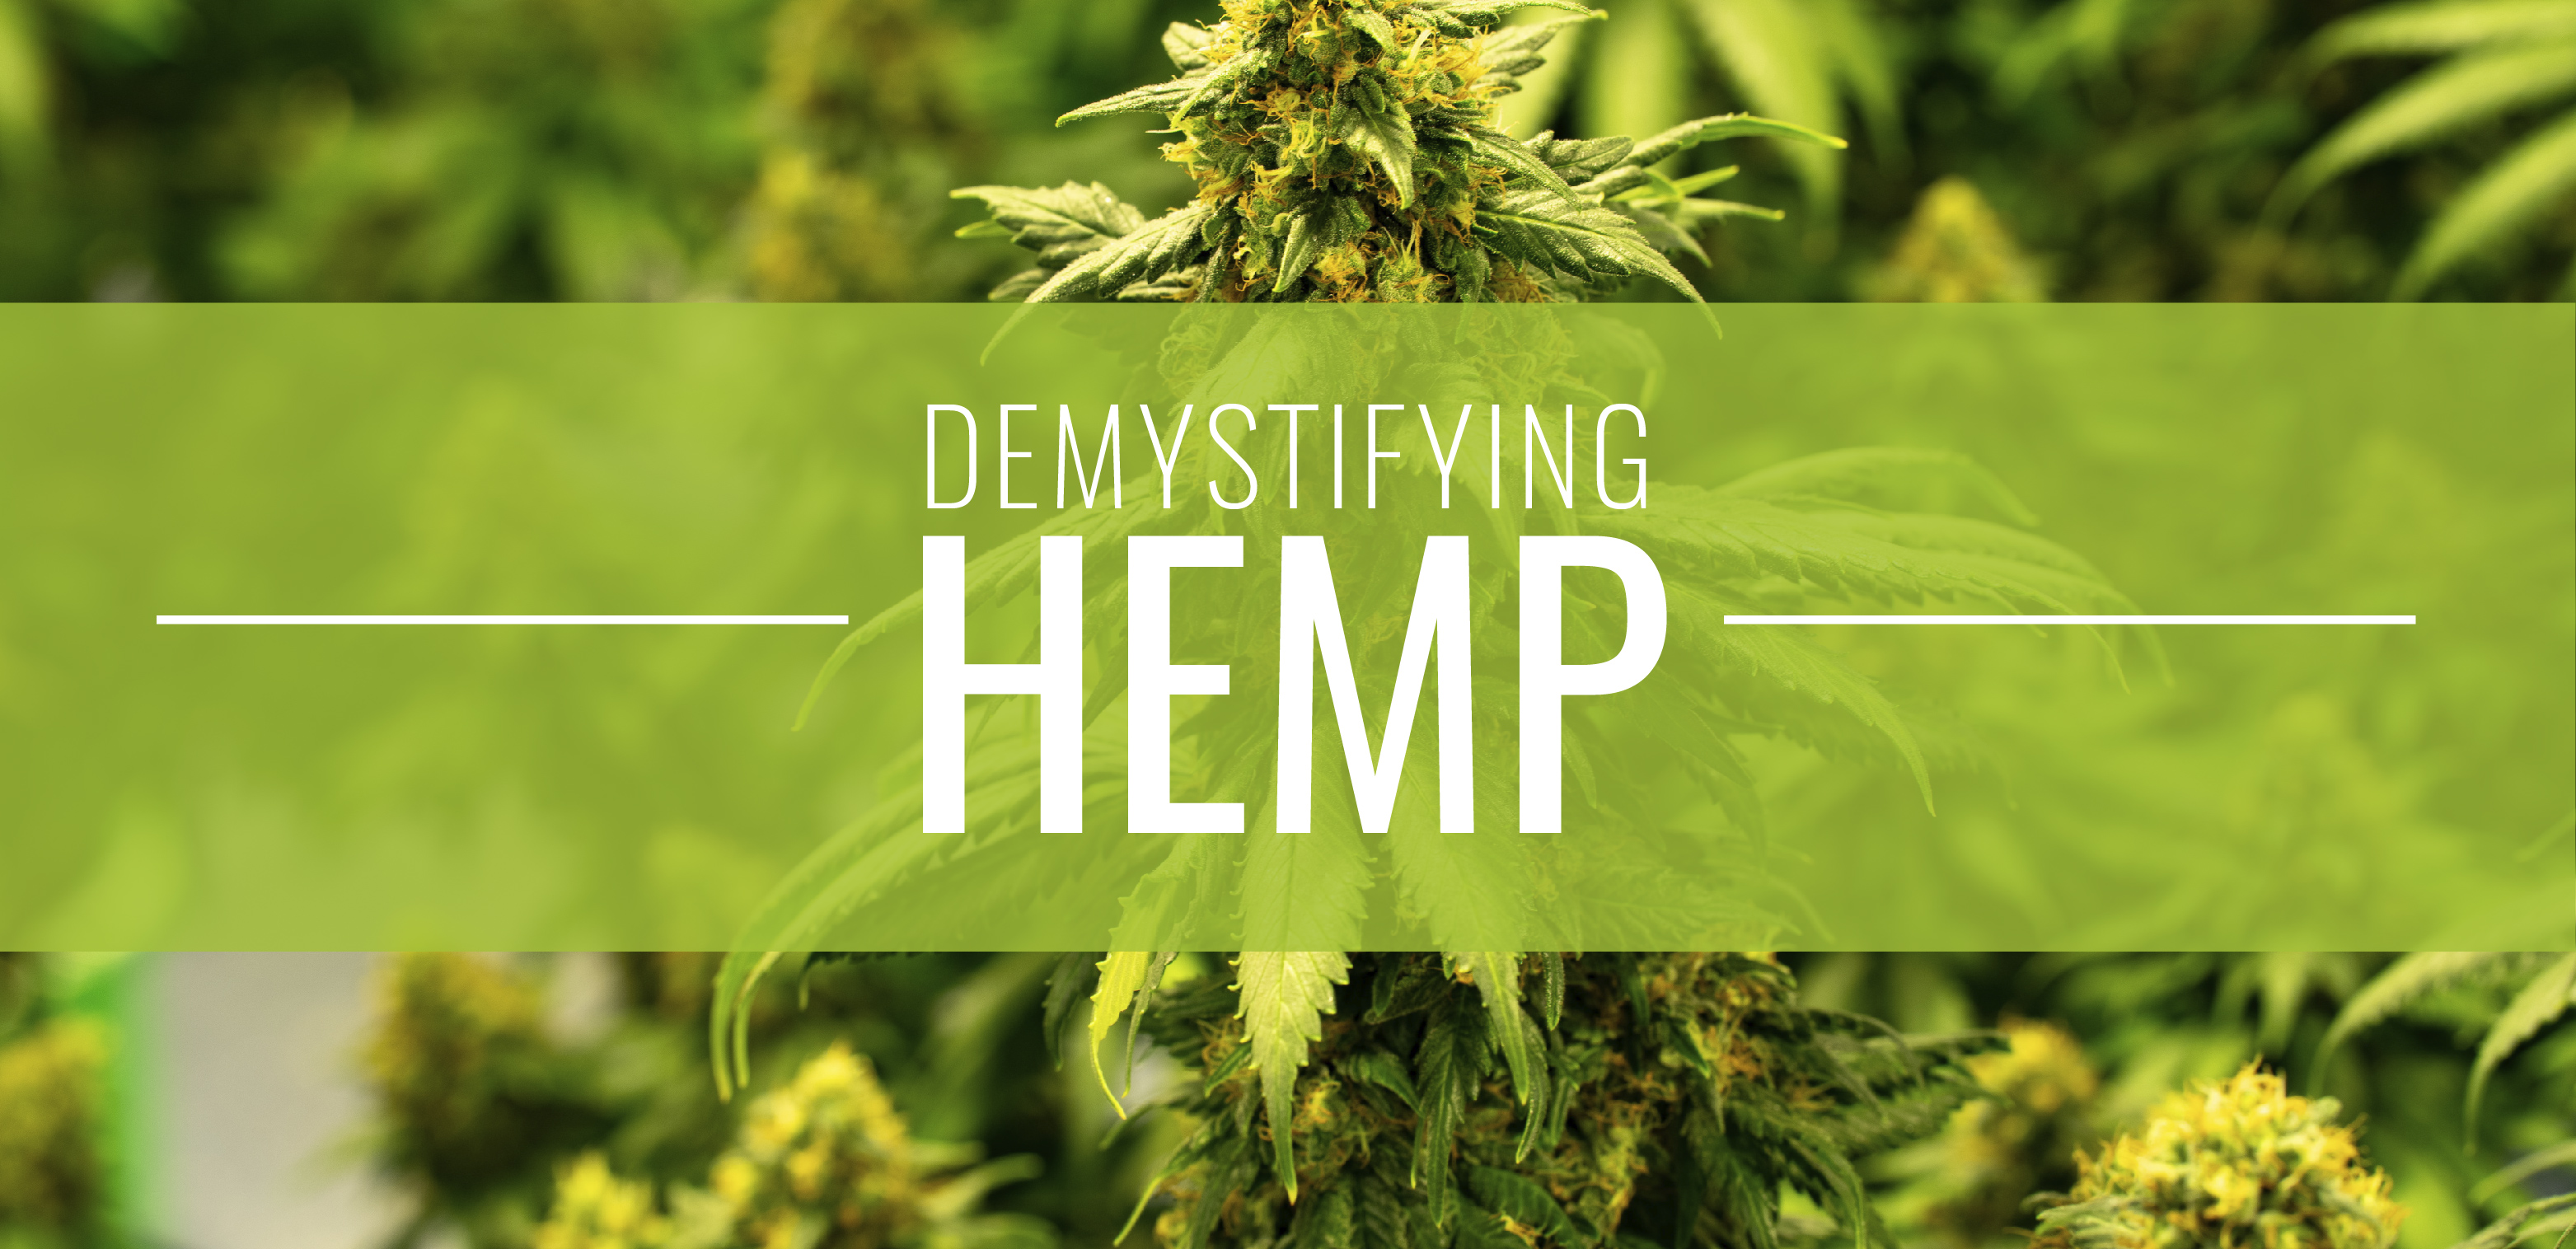 De-mystifying hemp